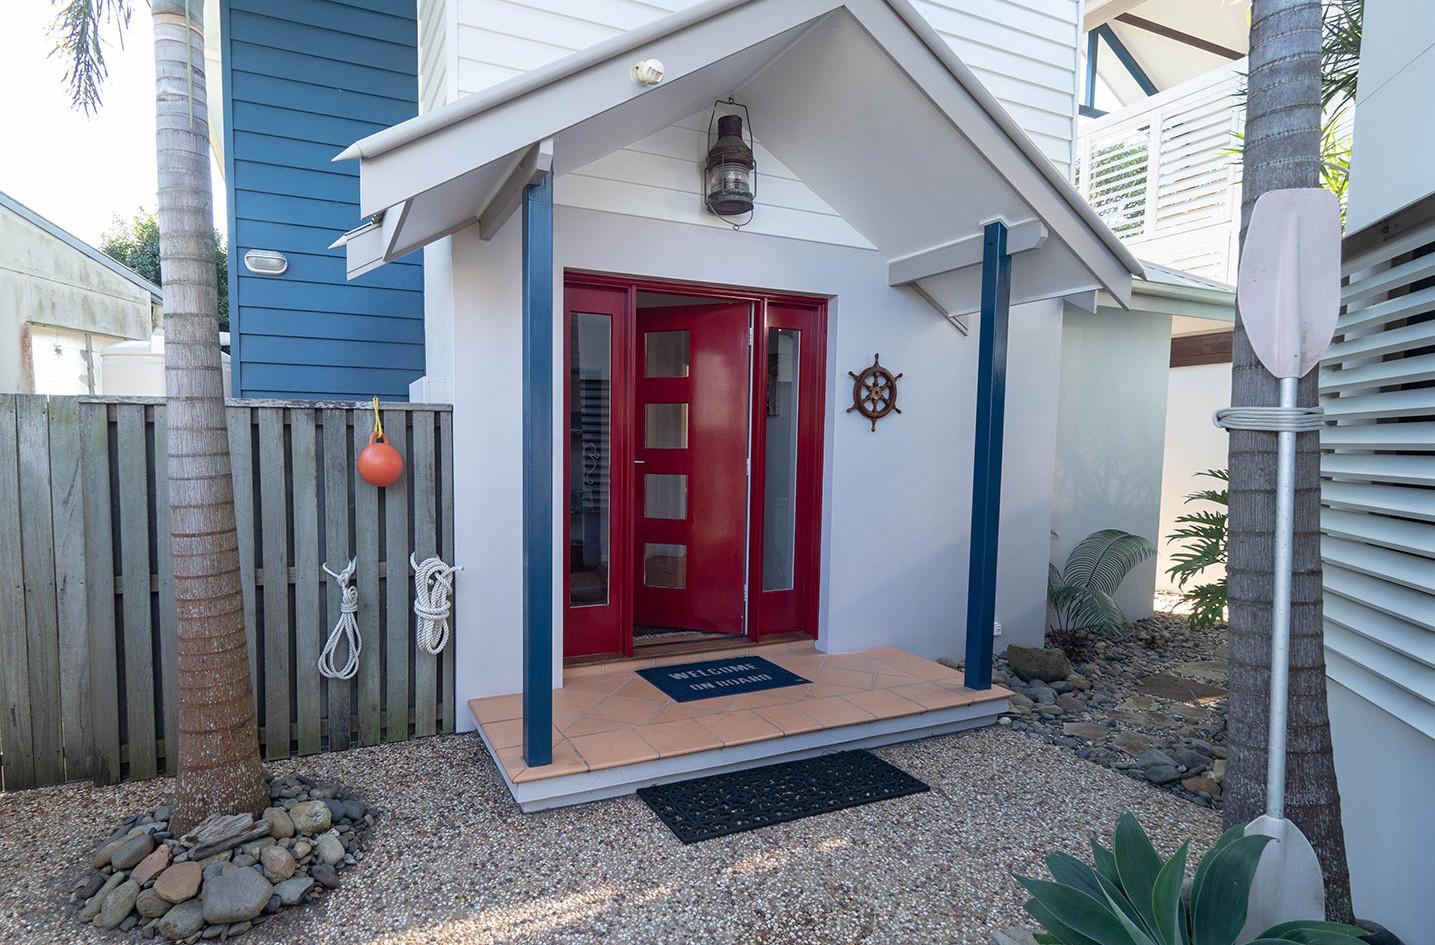 The-Boathouse-Yamba-Red-Door-Welcome.jpg